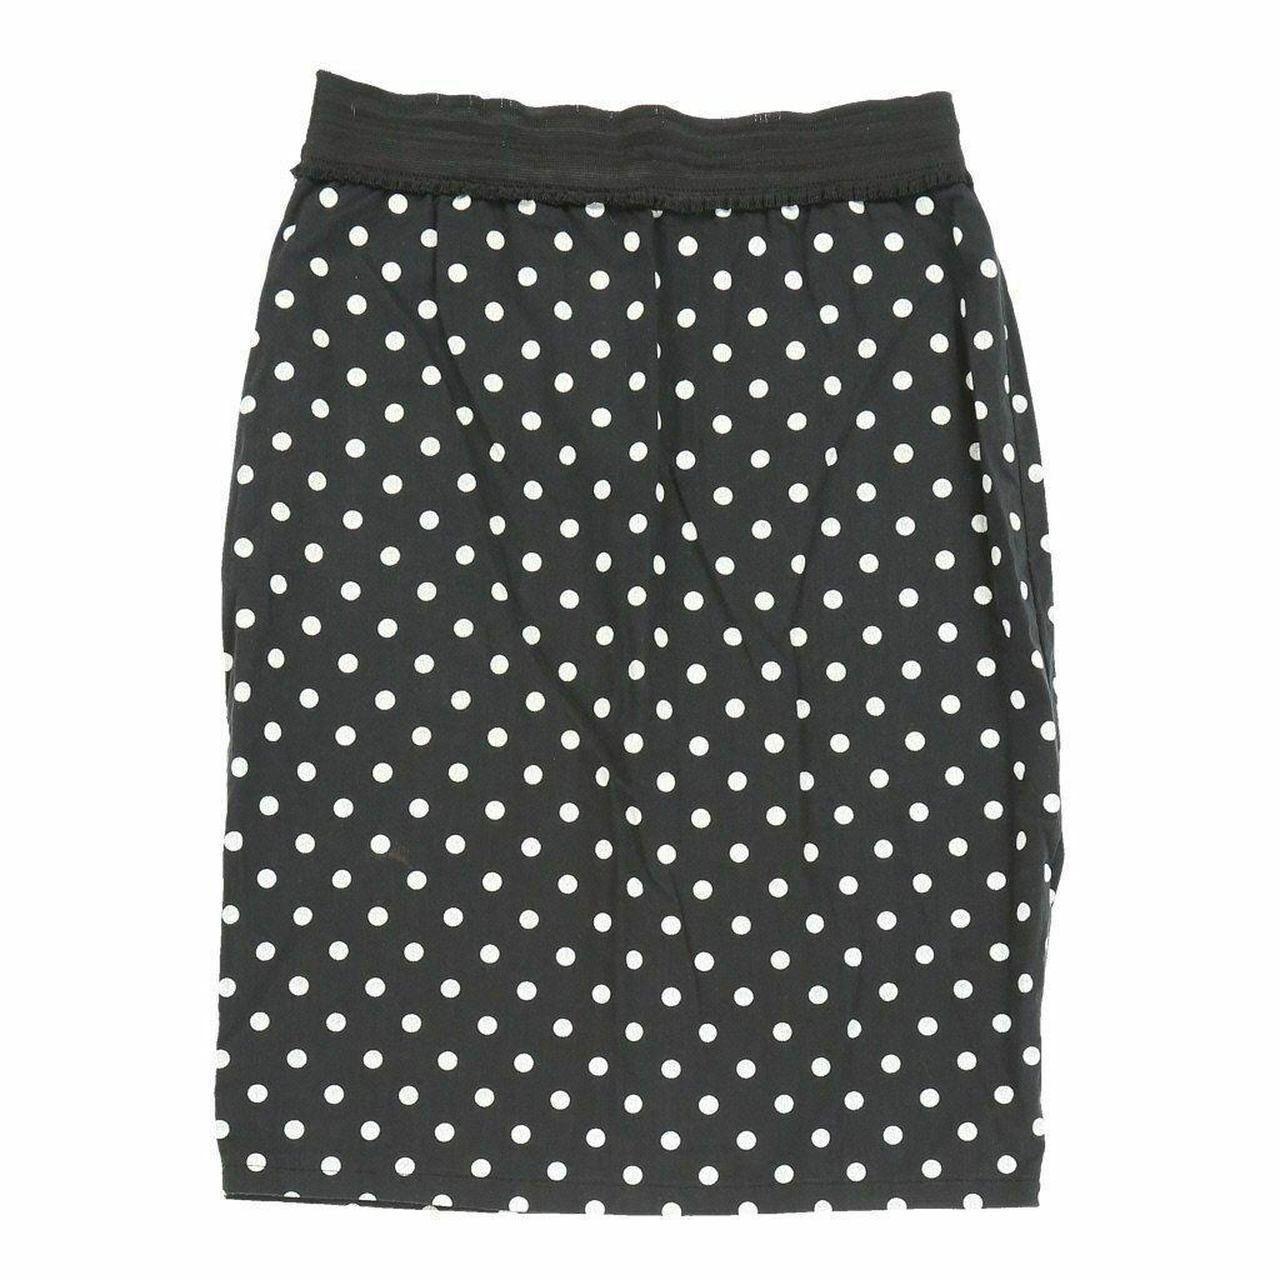 Product Image 1 - Vintage Skirt - Large Black